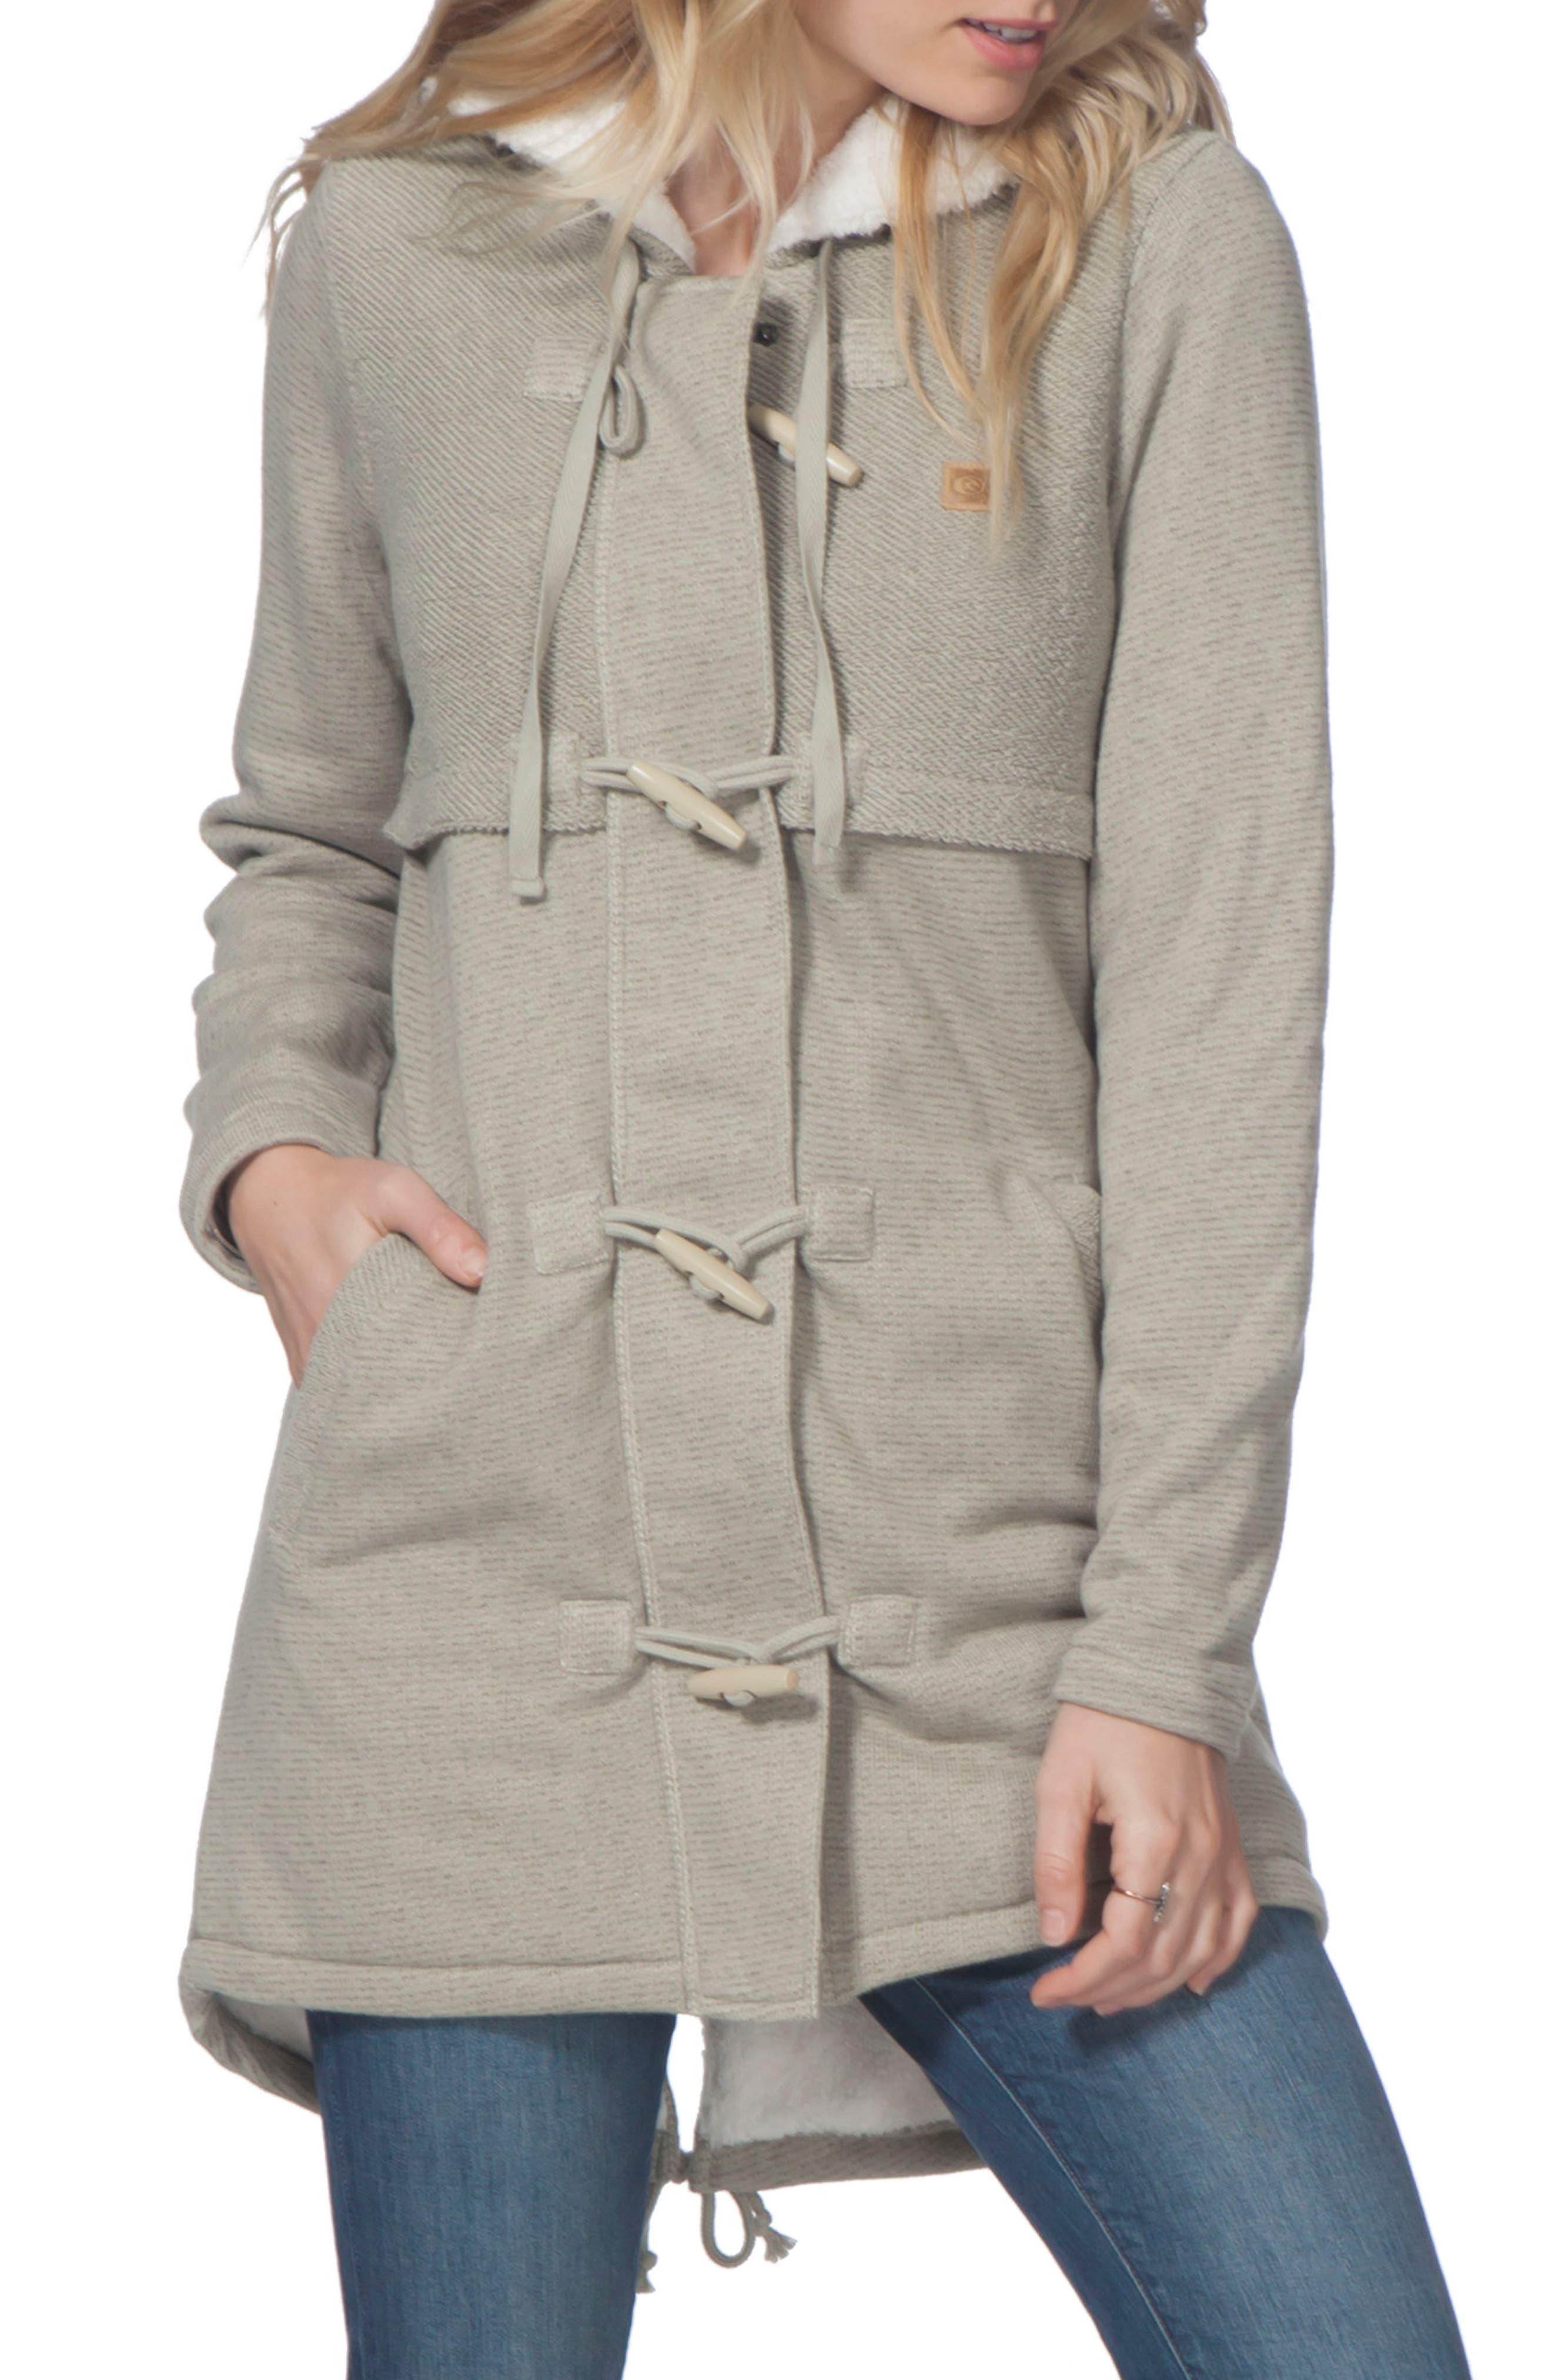 Rip Curl Penny Fleece Jacket